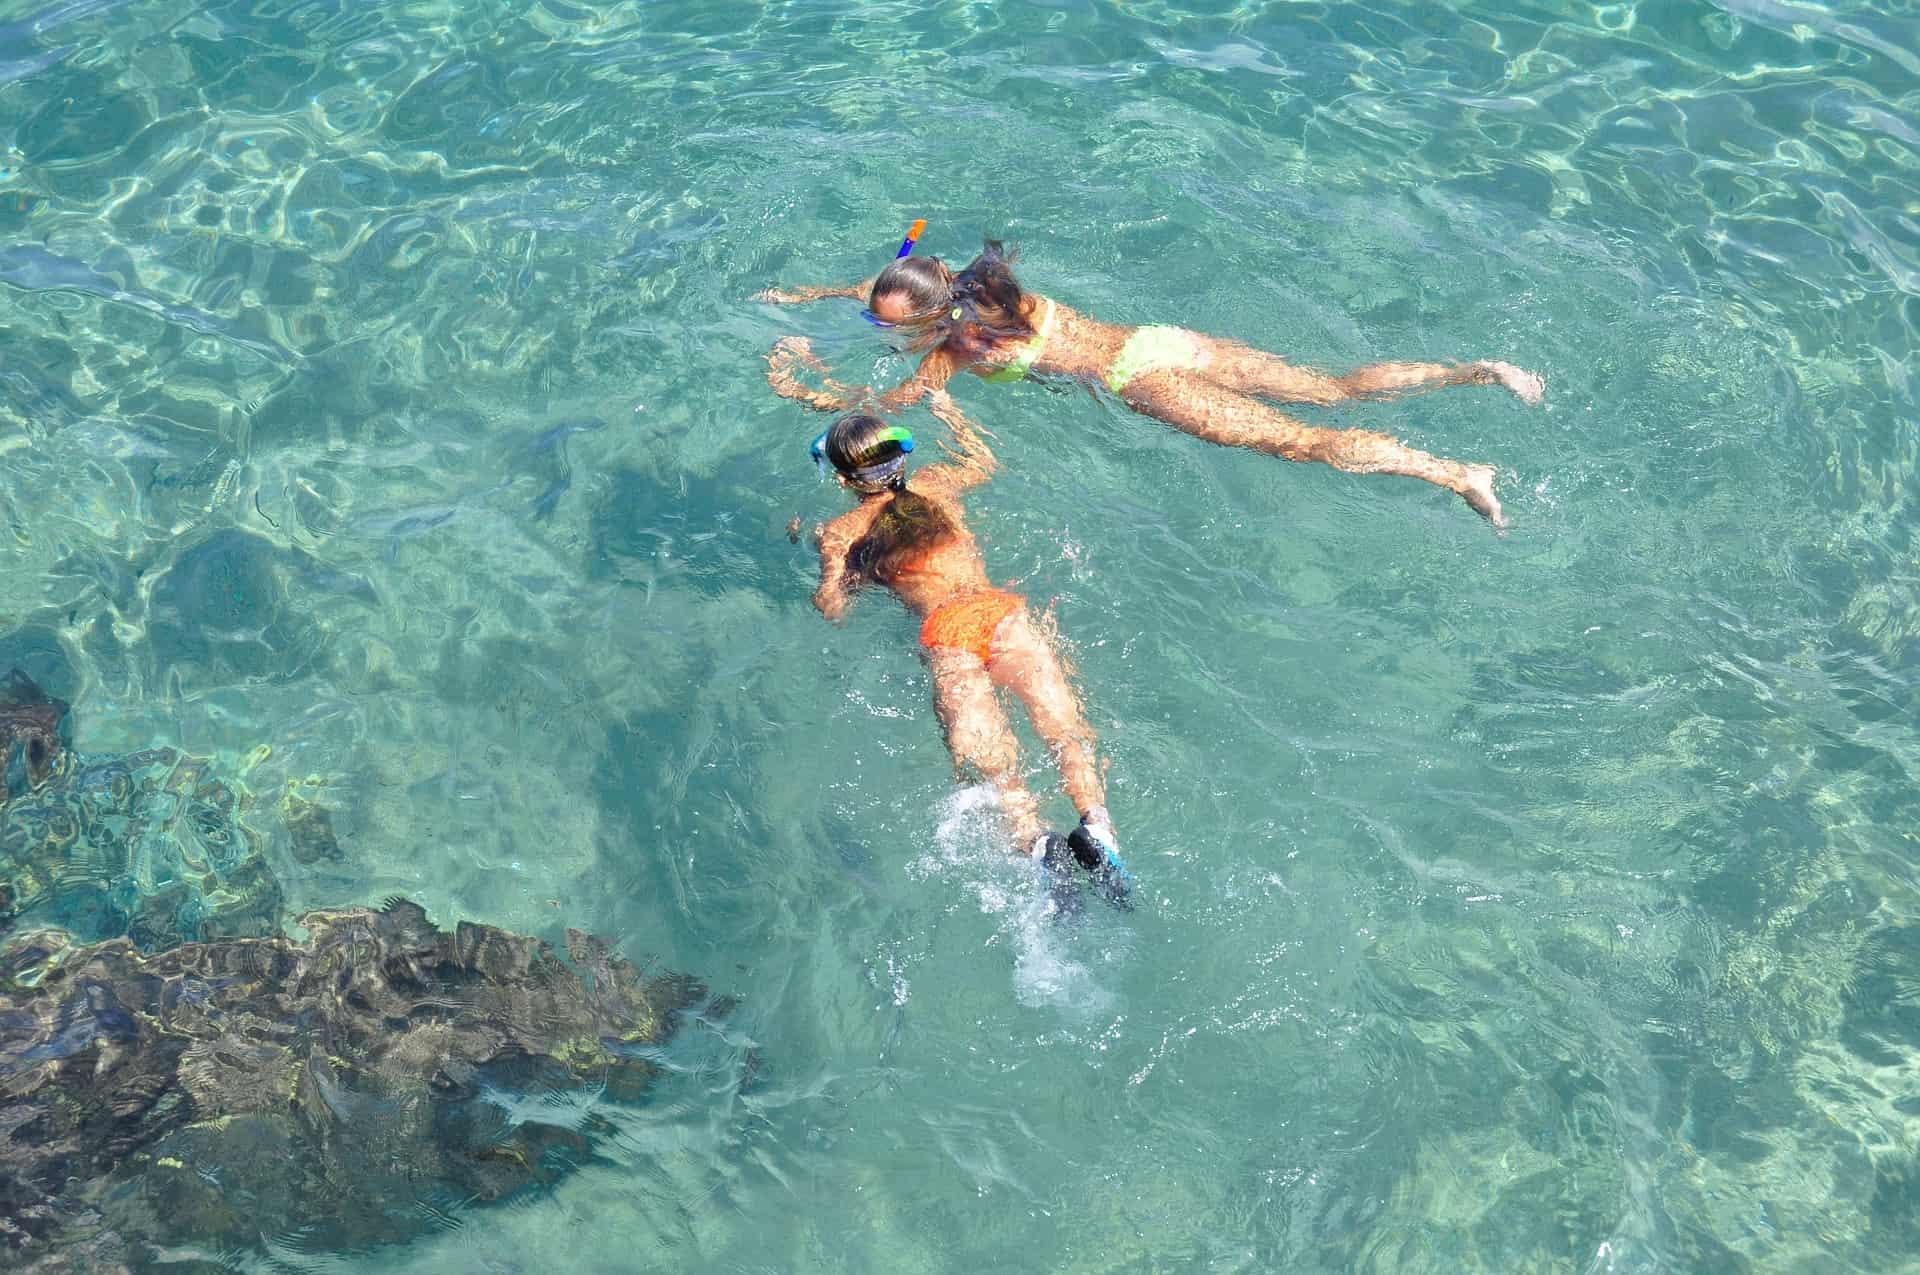 St John's, Antigua Snorkling